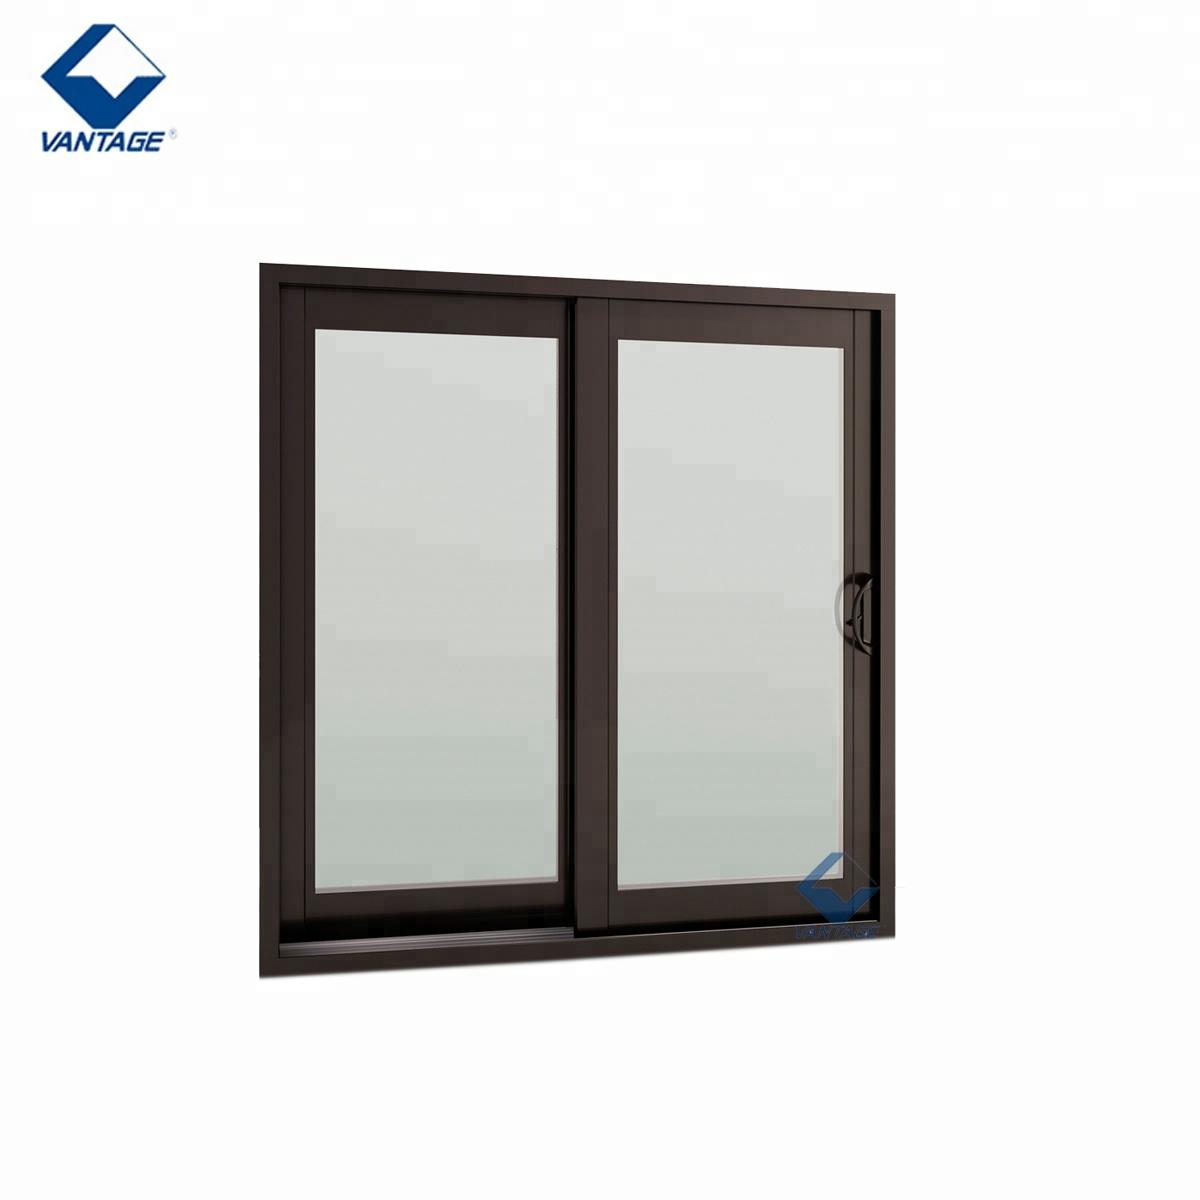 Office Sliding Glass Window Aluminium Double Glazed Windows And